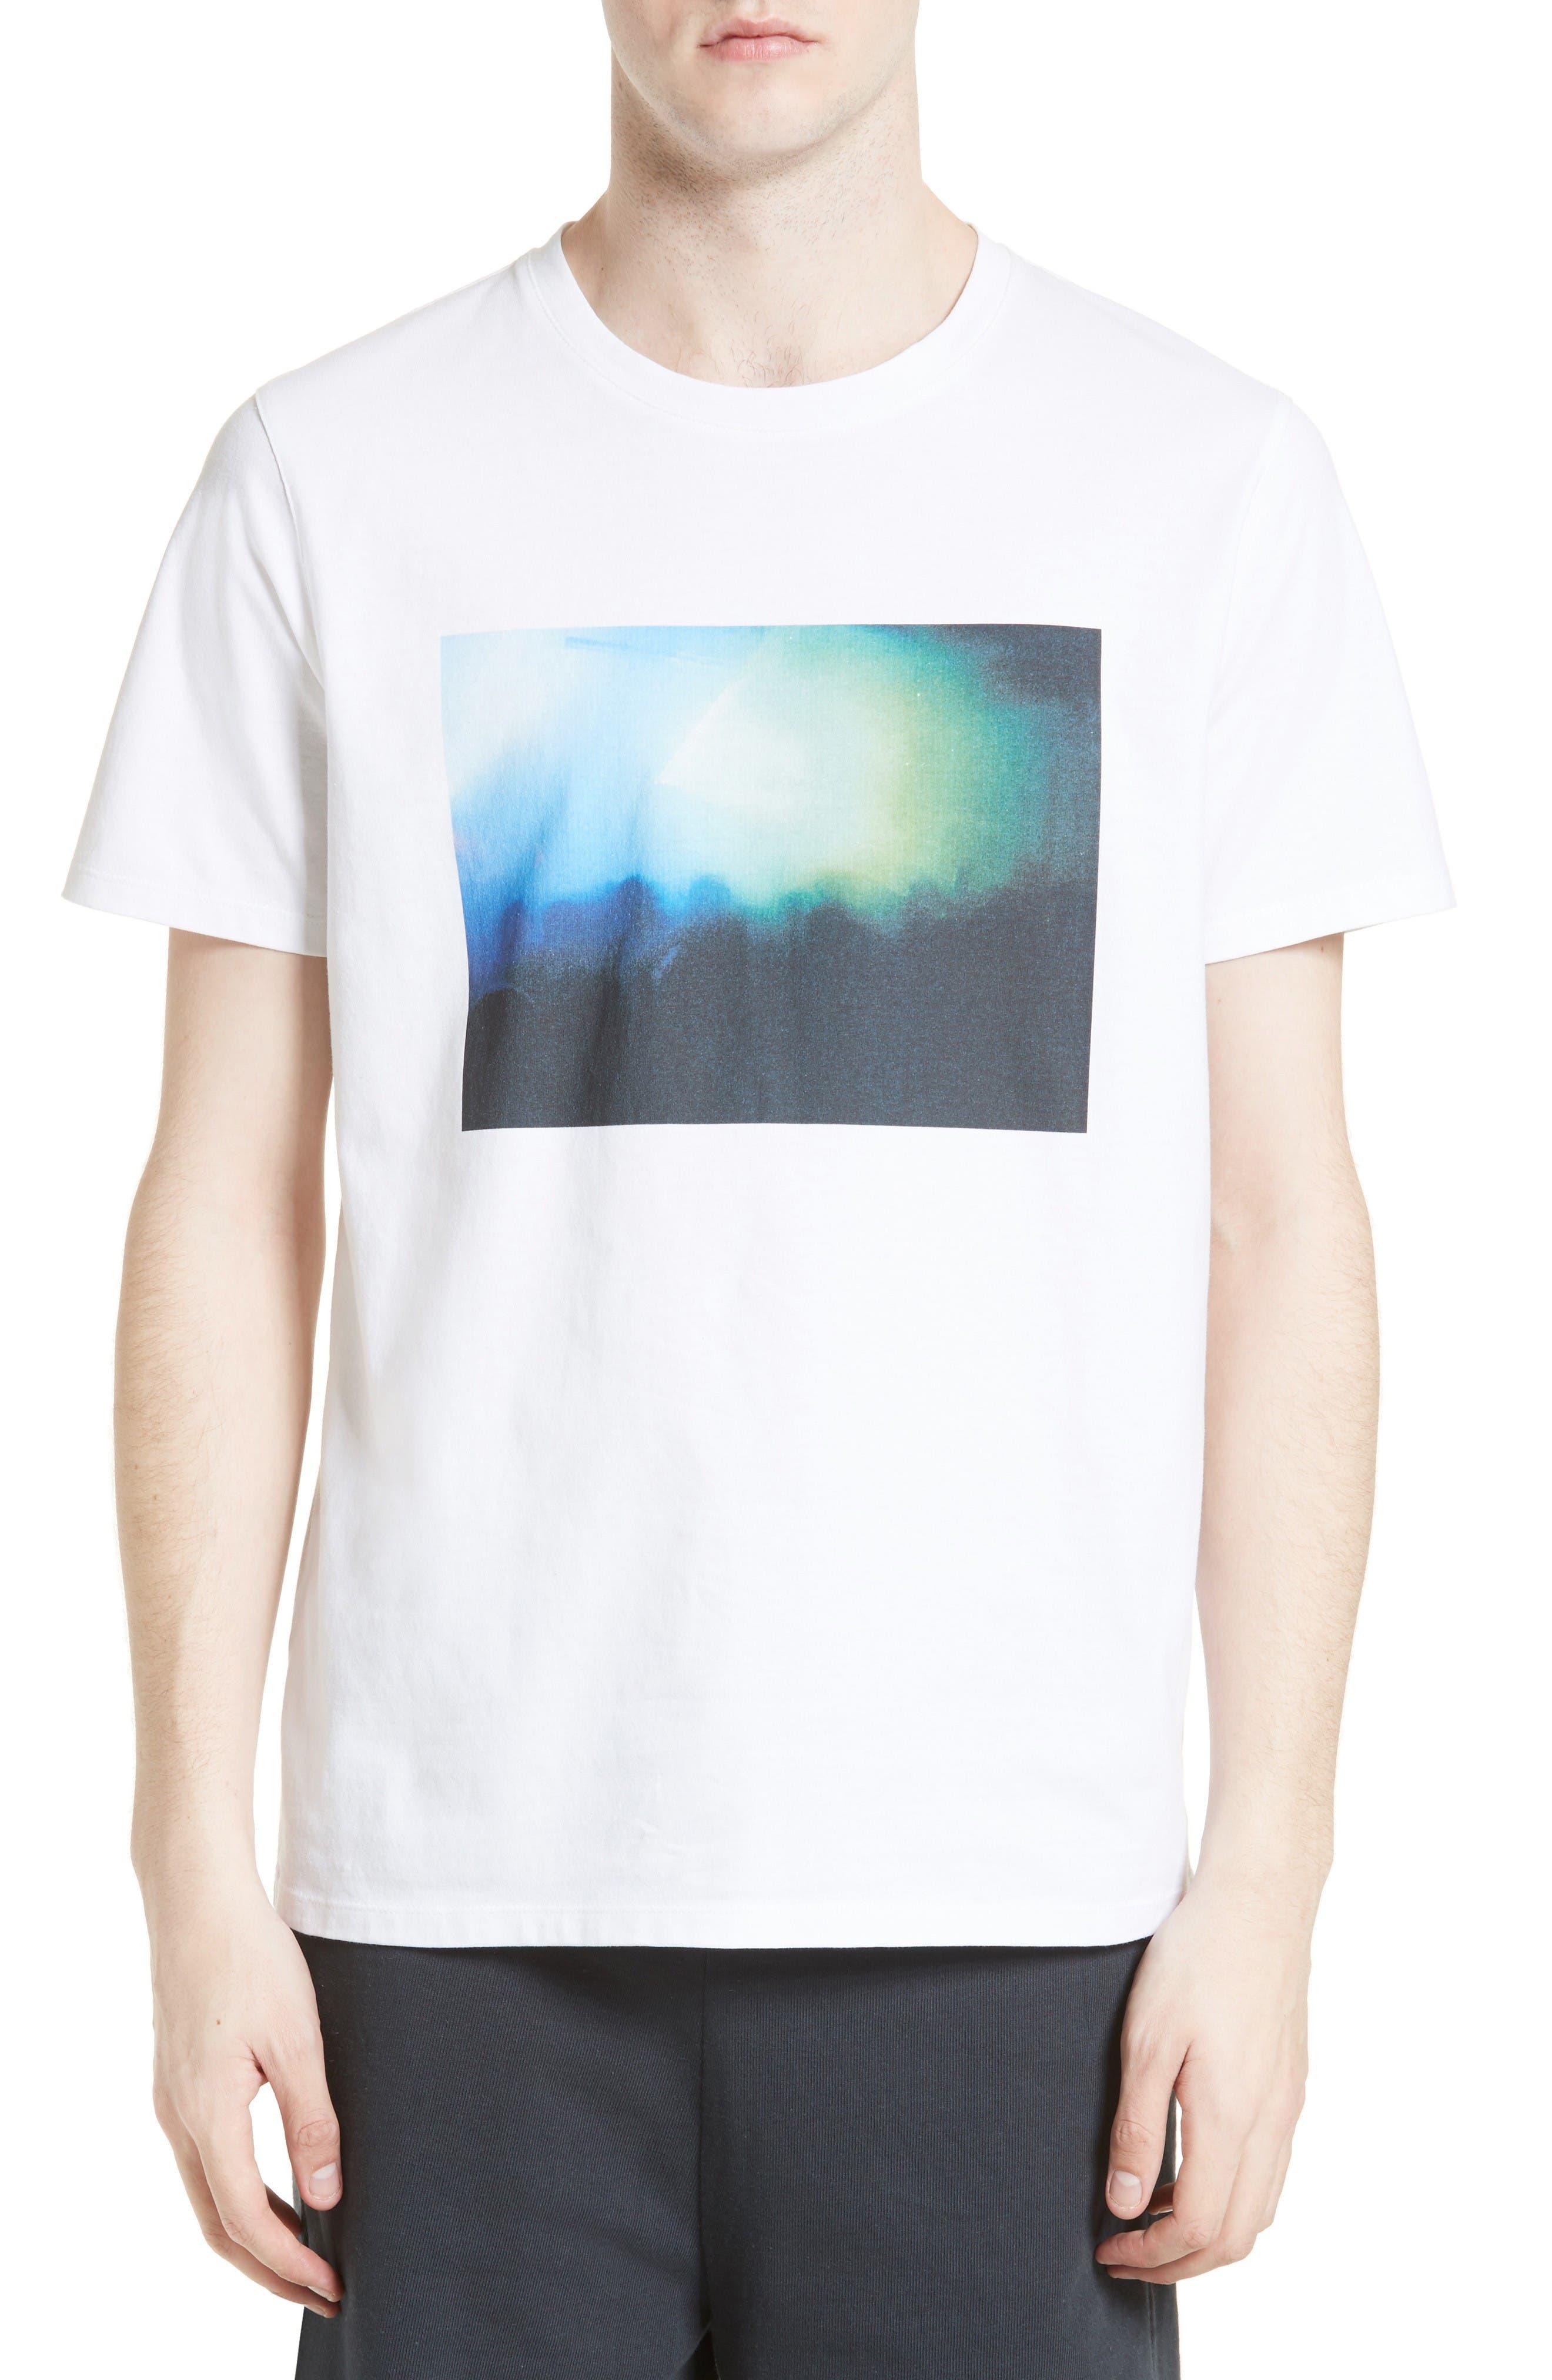 A.P.C. Gig Screenprint T-Shirt